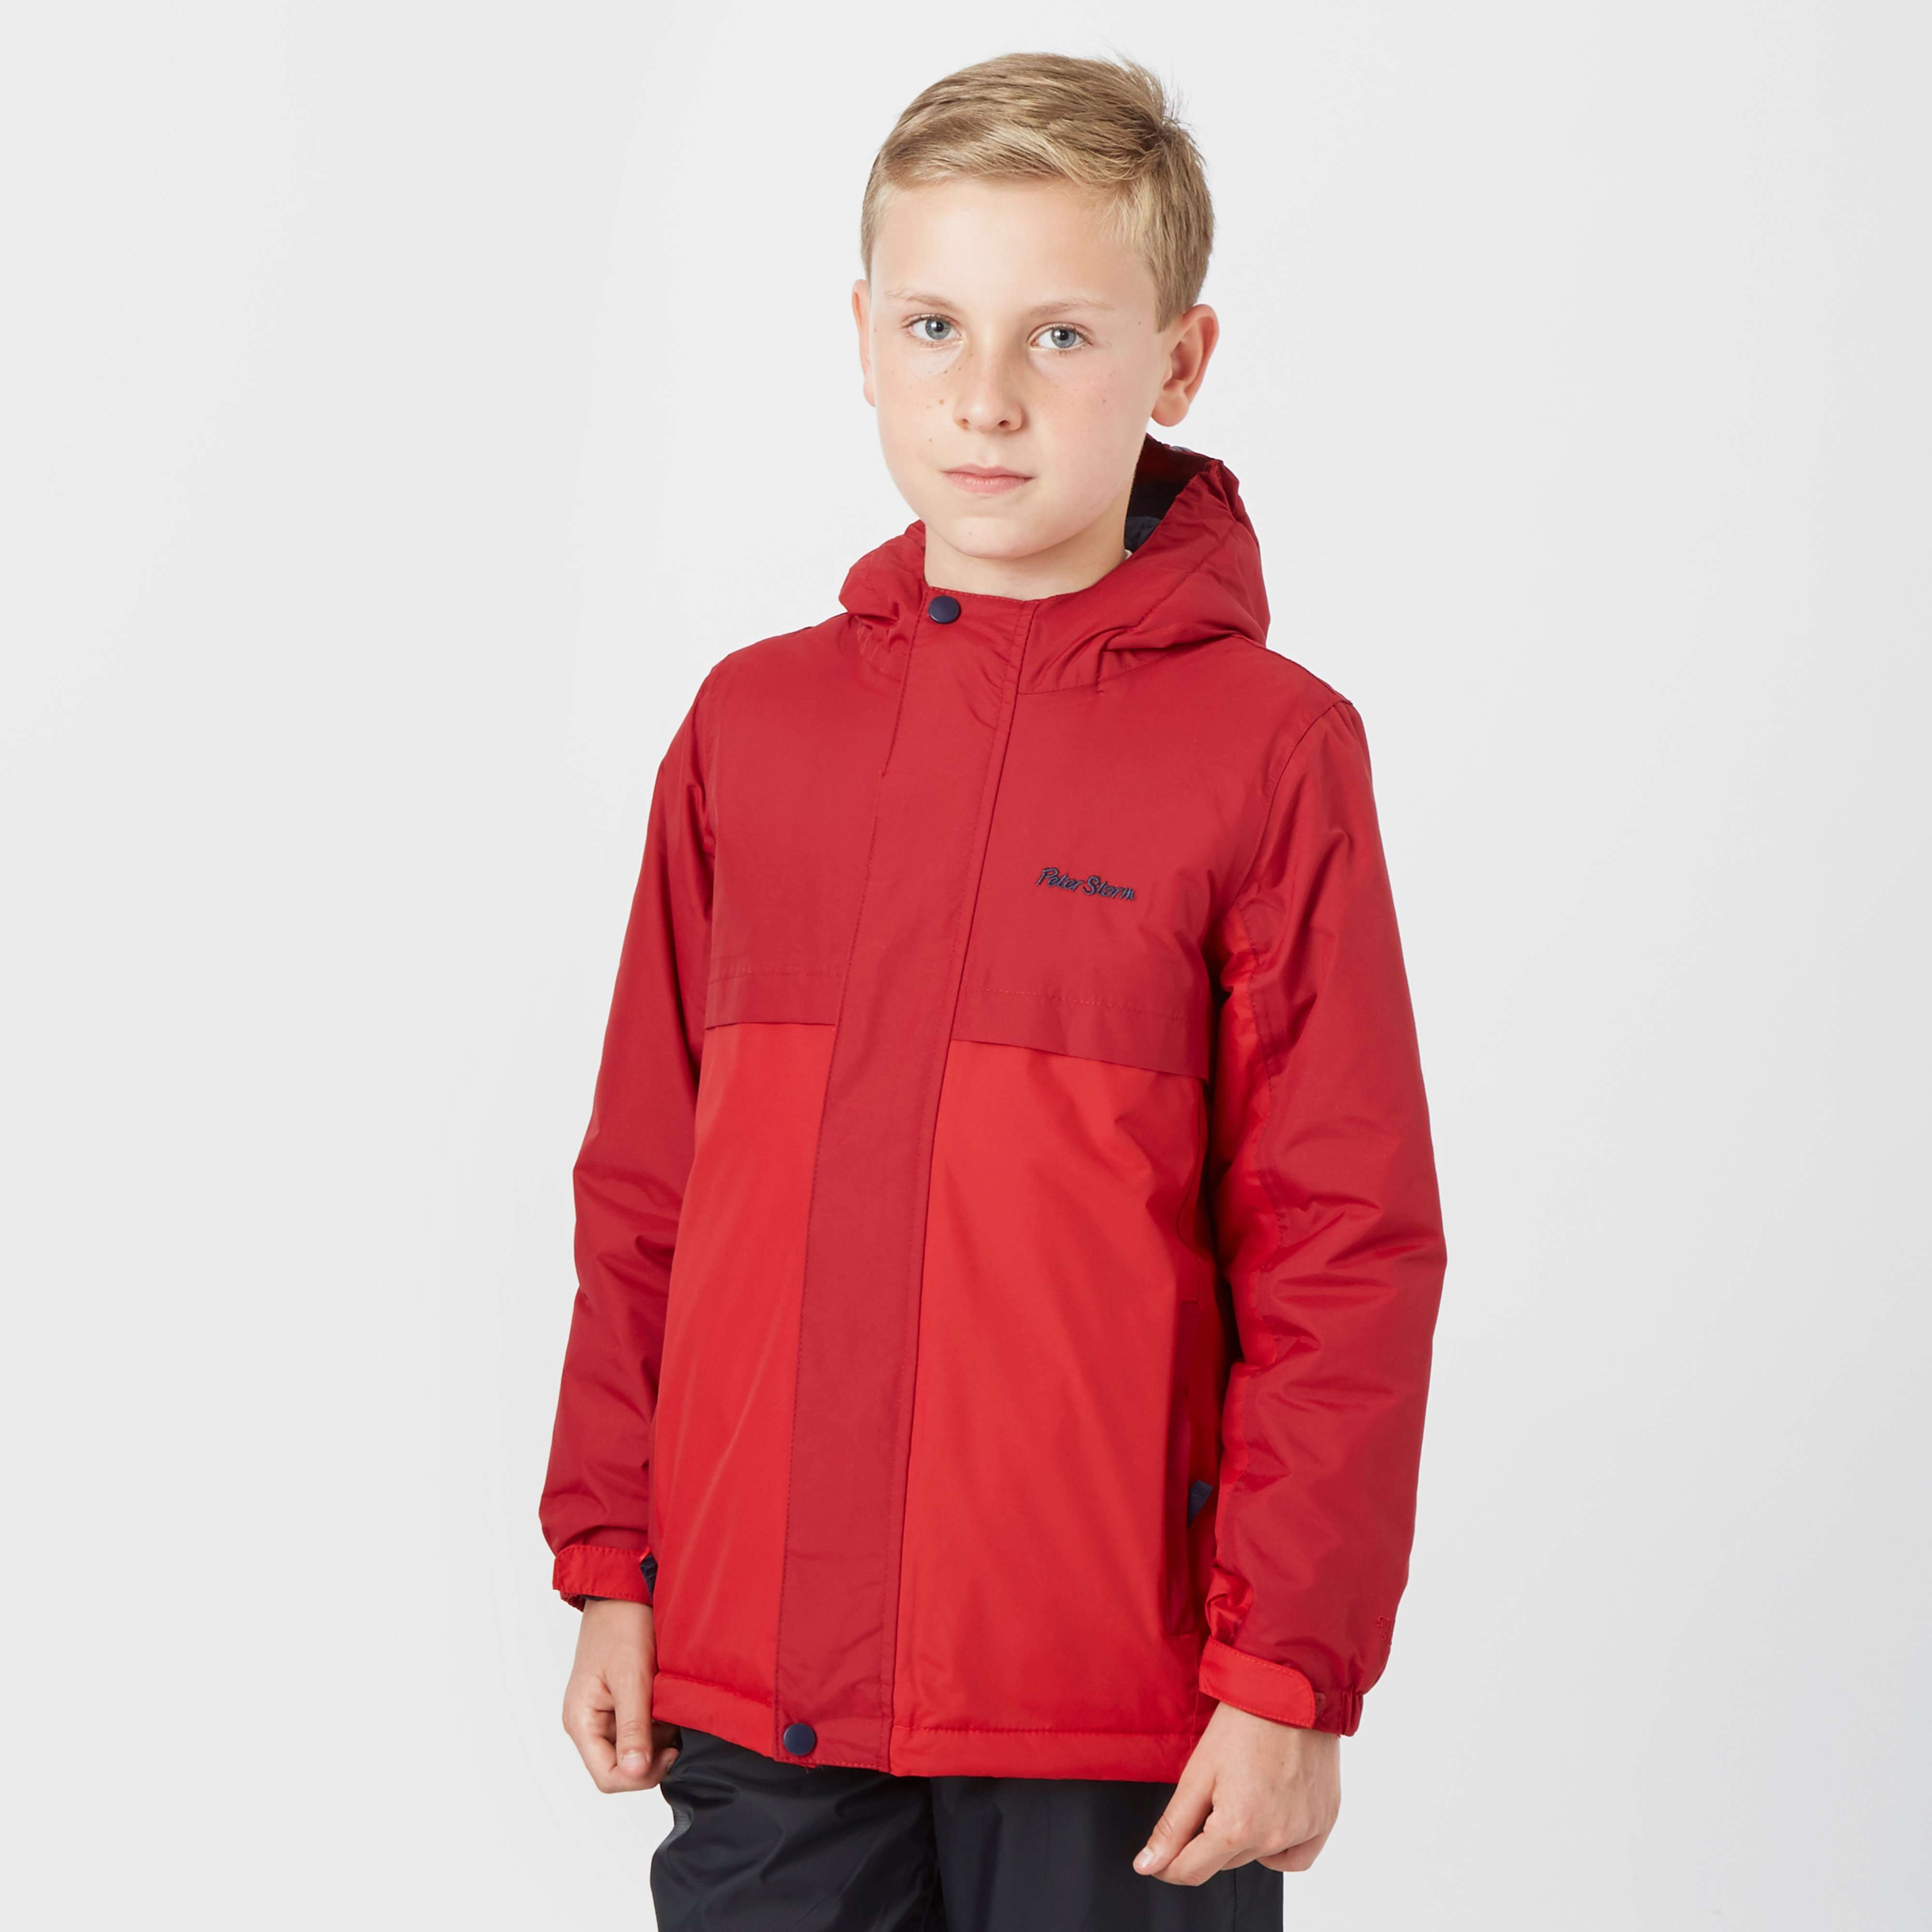 PETER STORM Boy's Insulated Waterproof Jacket